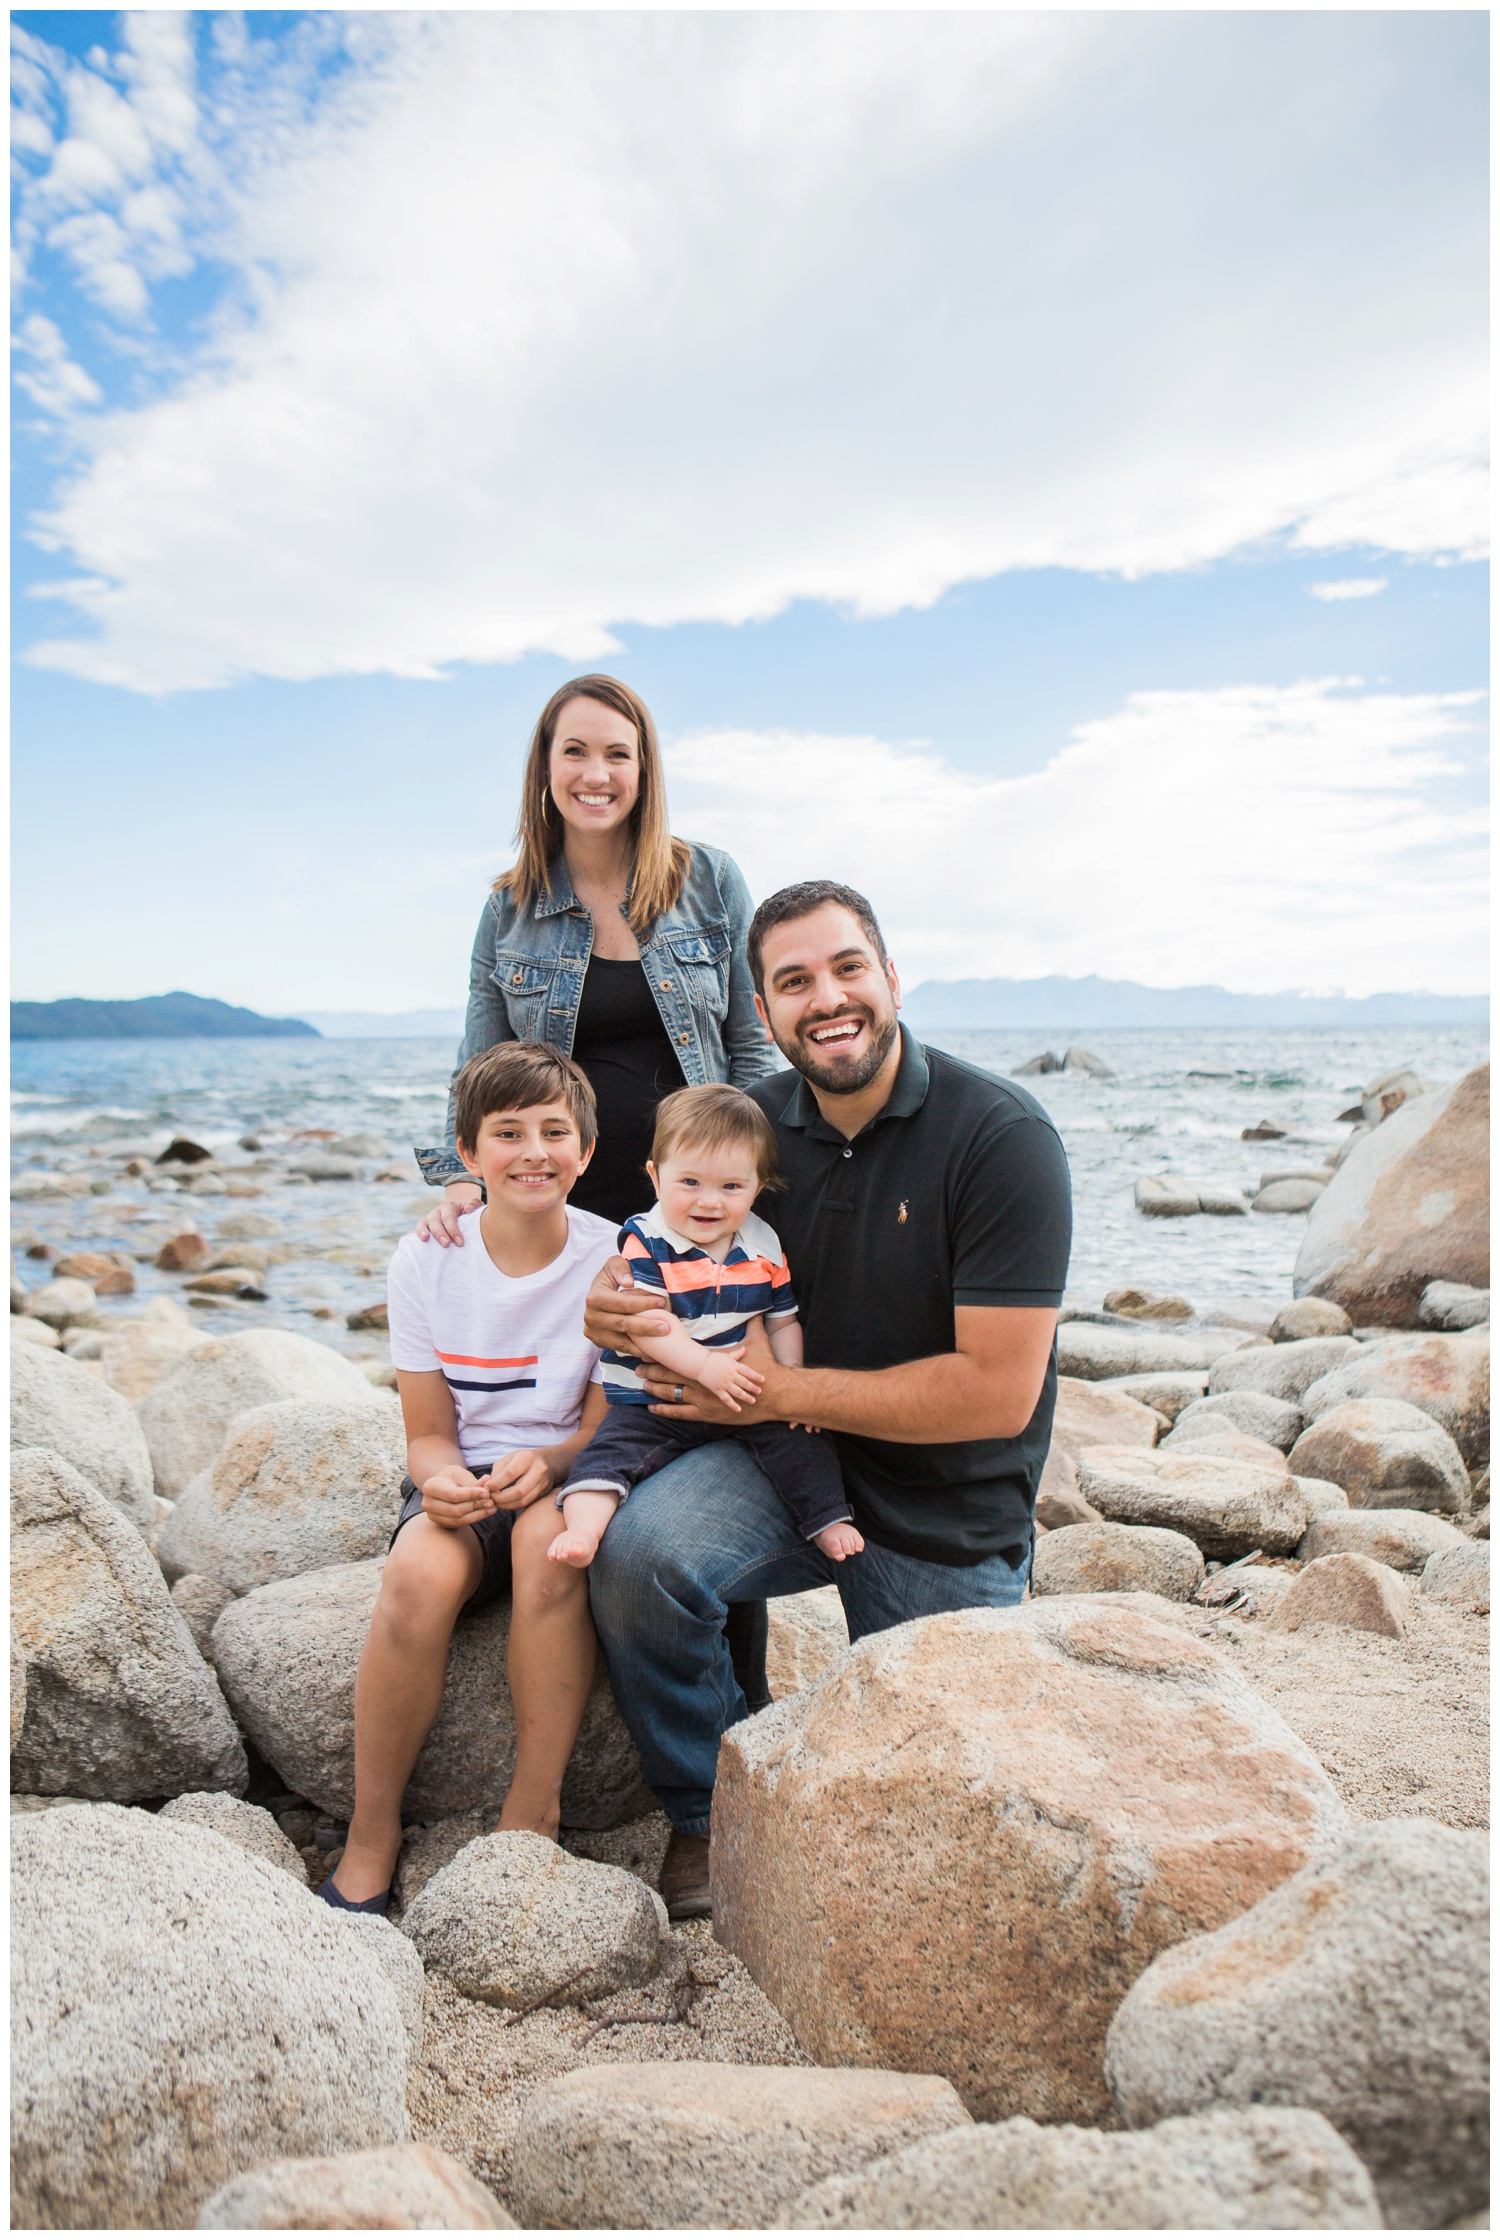 beach family pictures what to wear Kristi Gayton